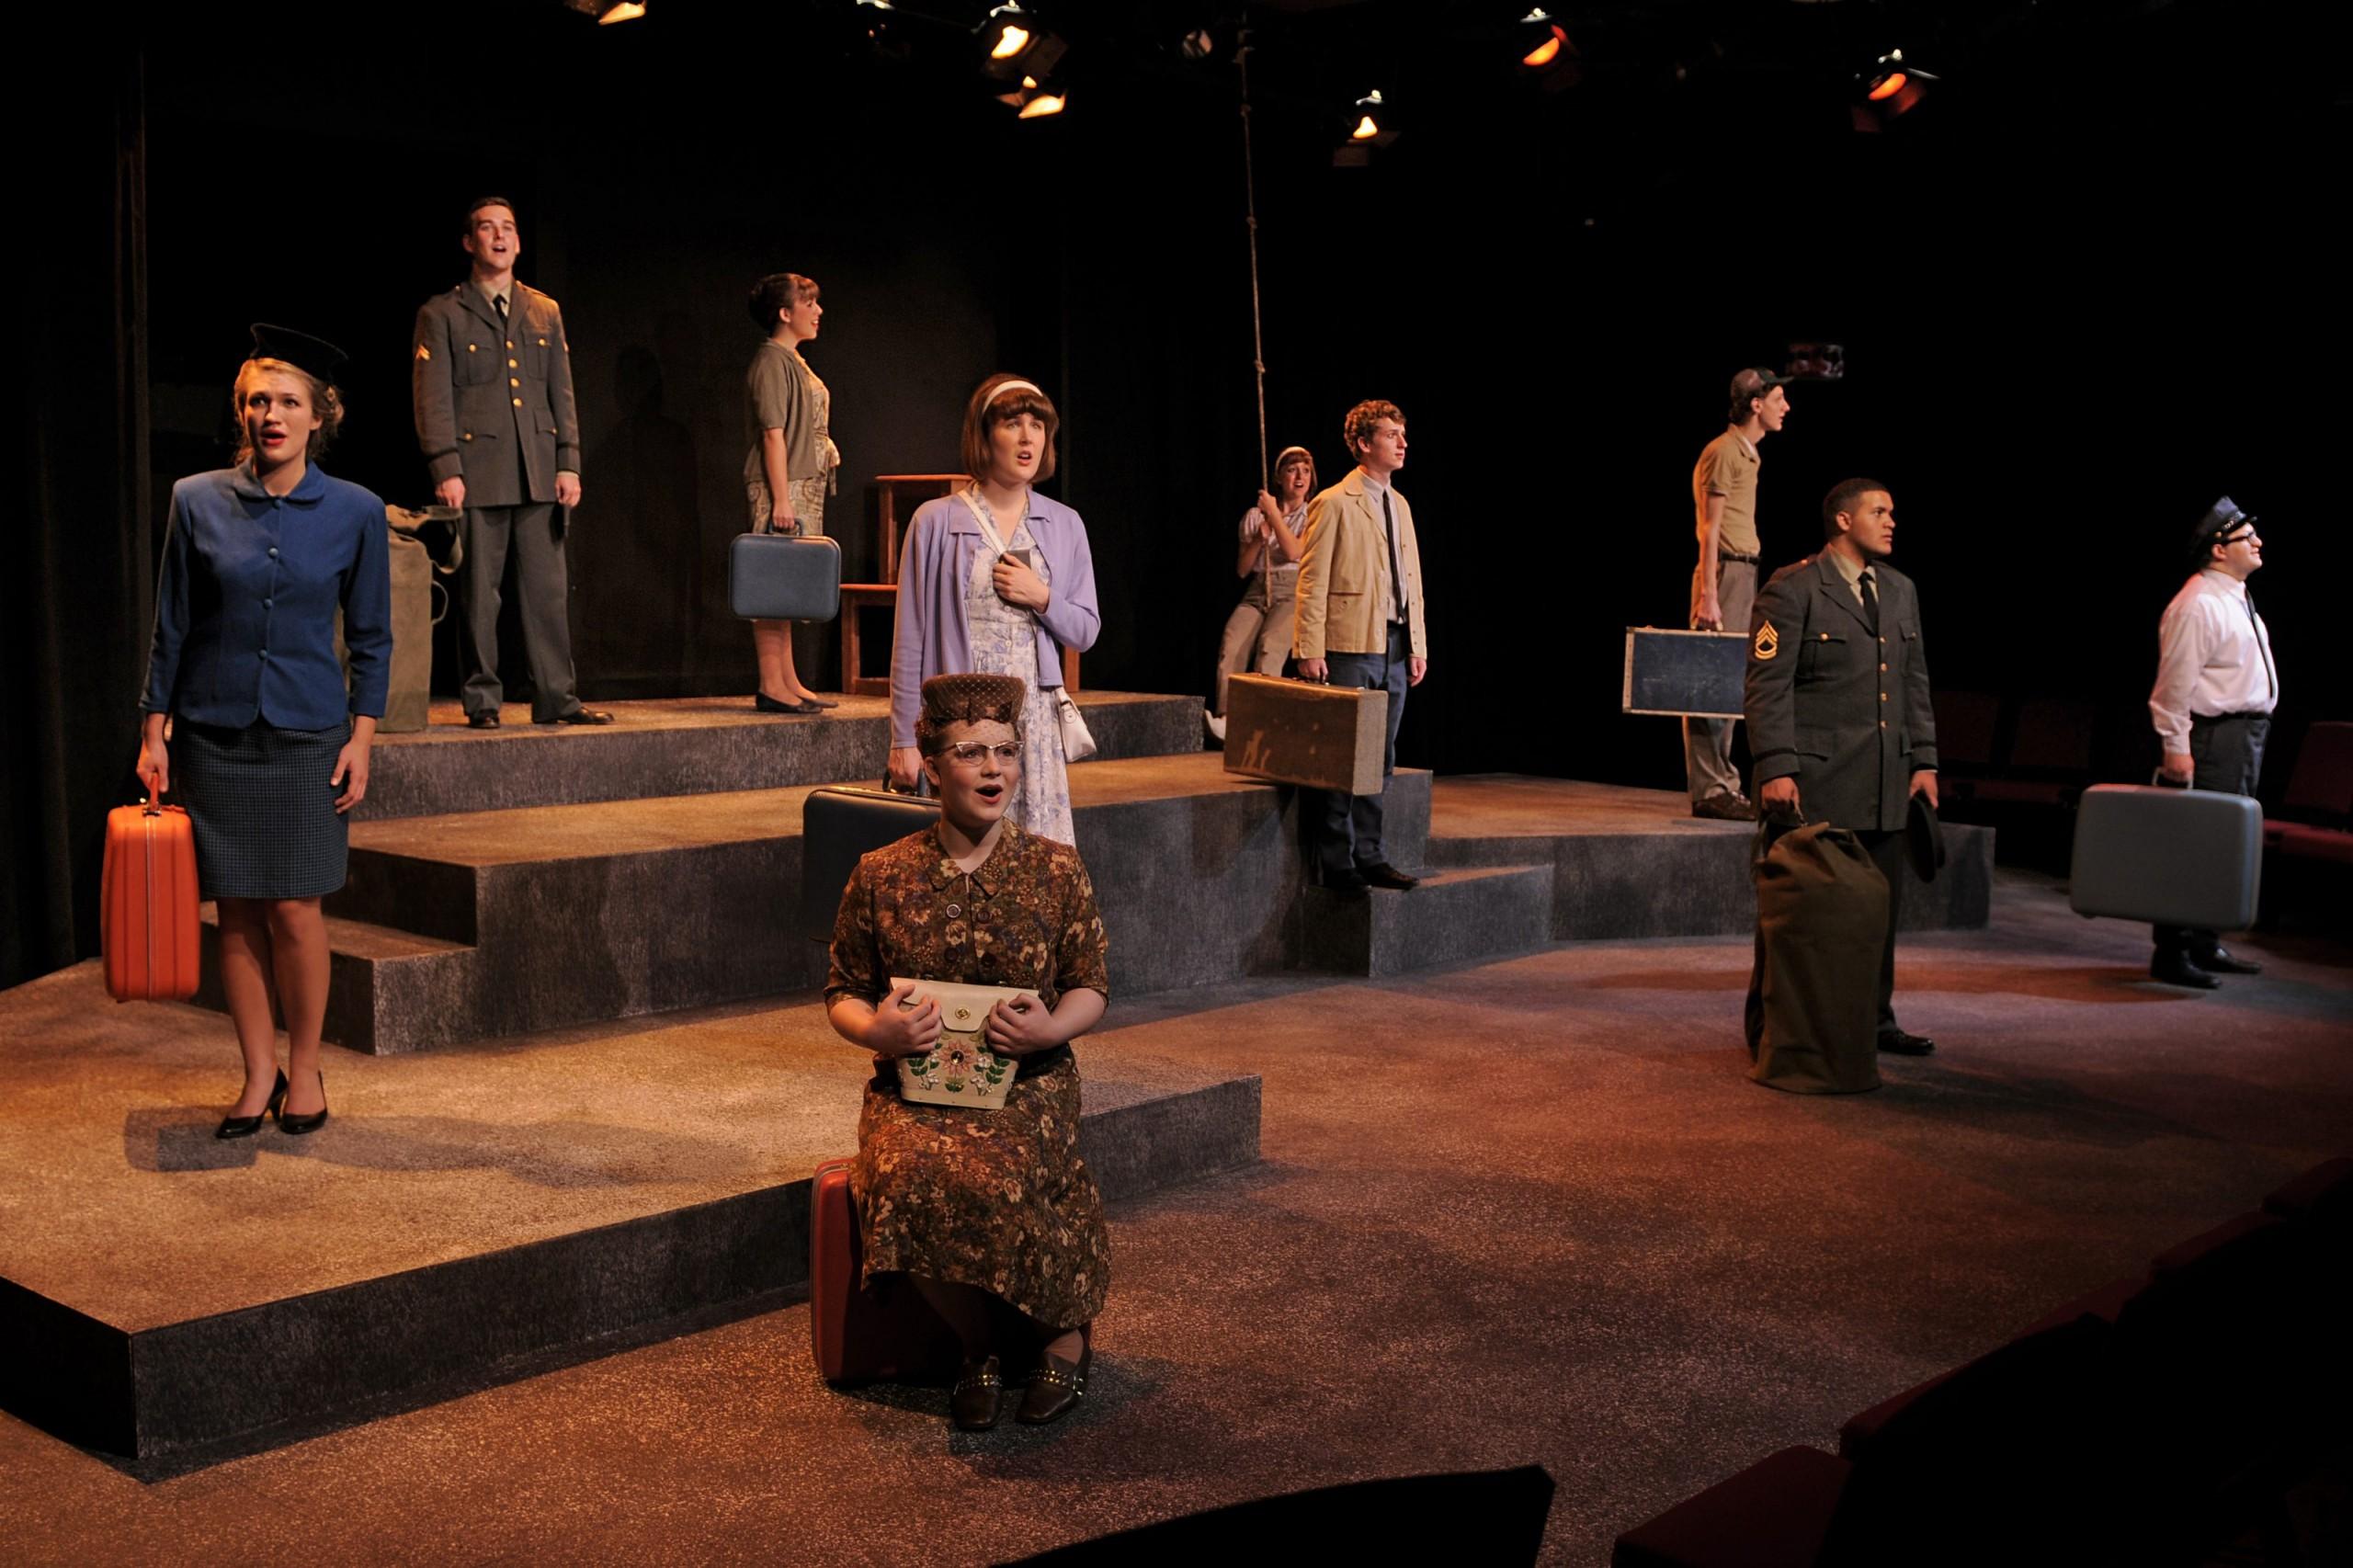 Dissertation On Musical Theatre